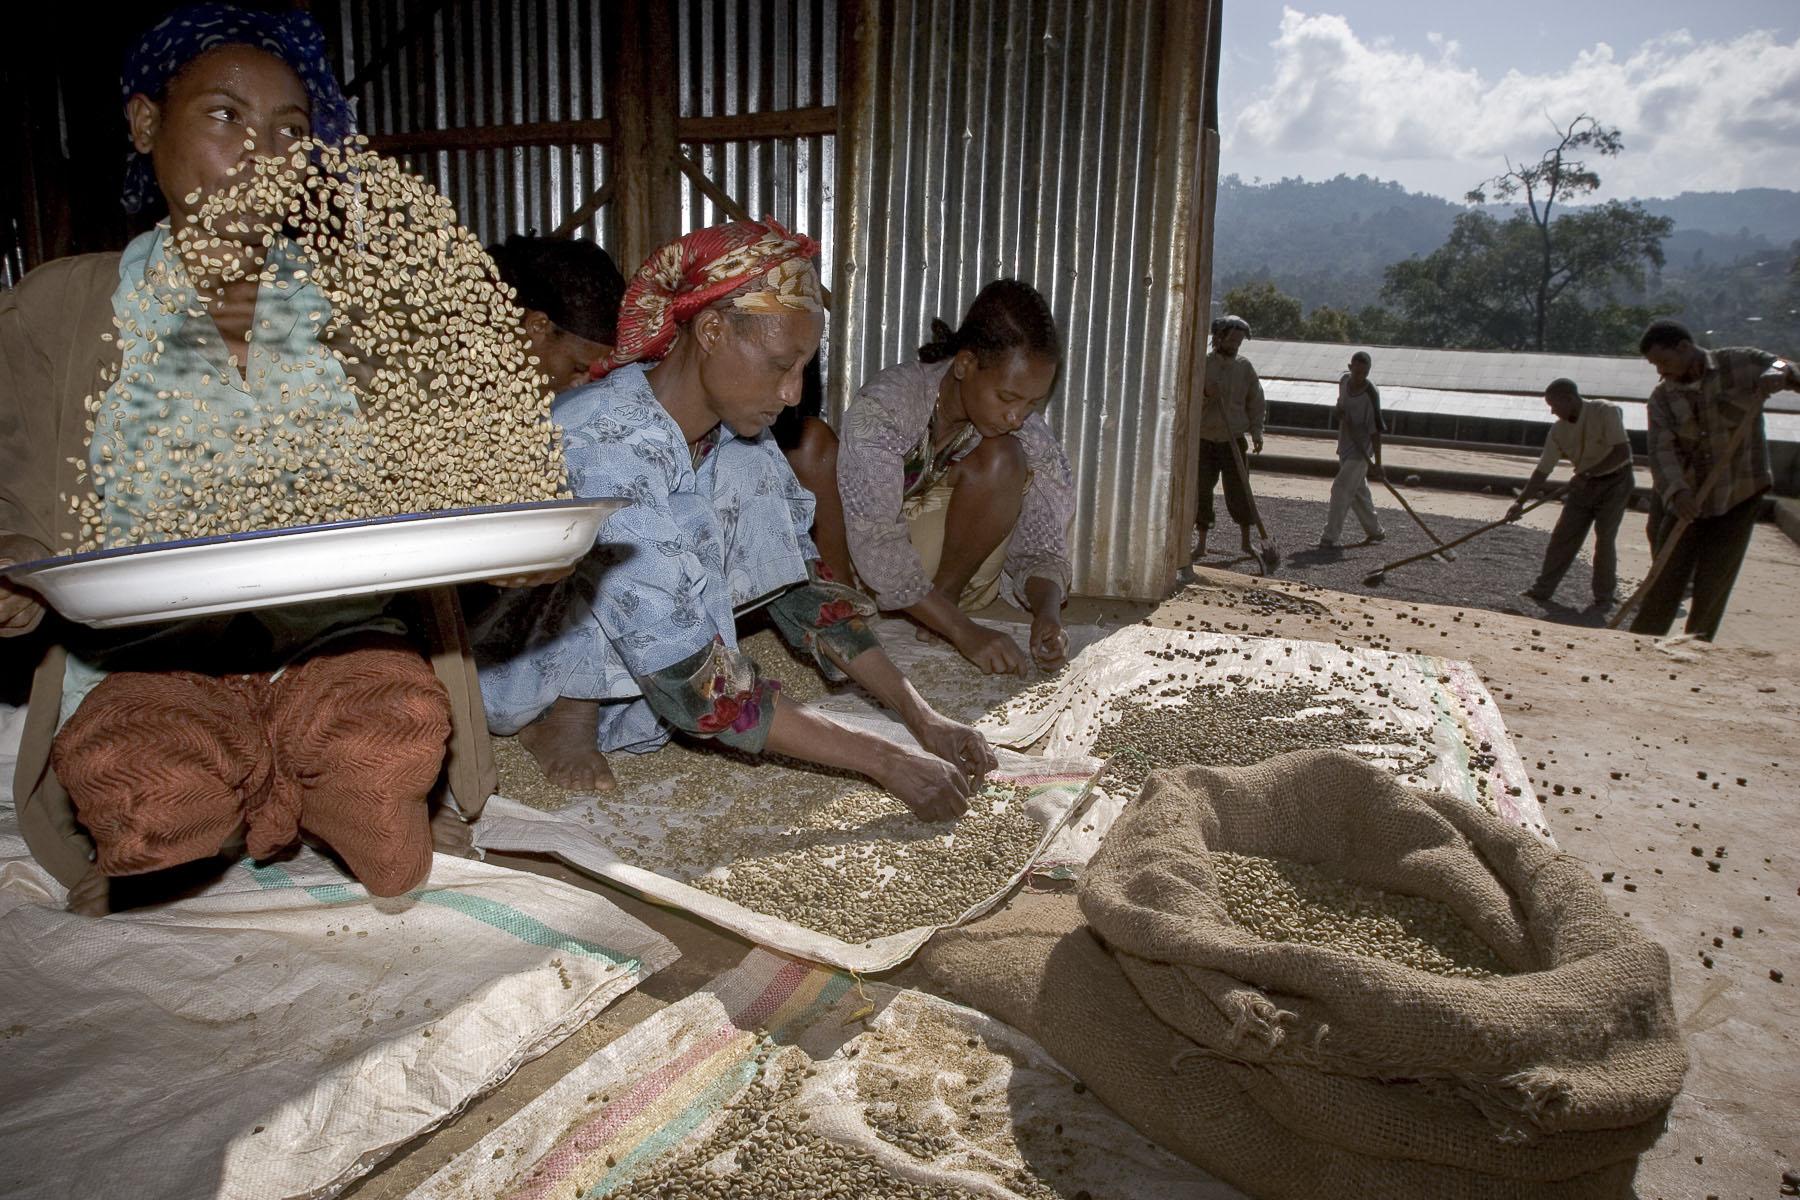 Bonga, the homeland of coffee. Coffee shelling. Women sorting coffee beans in November 2004